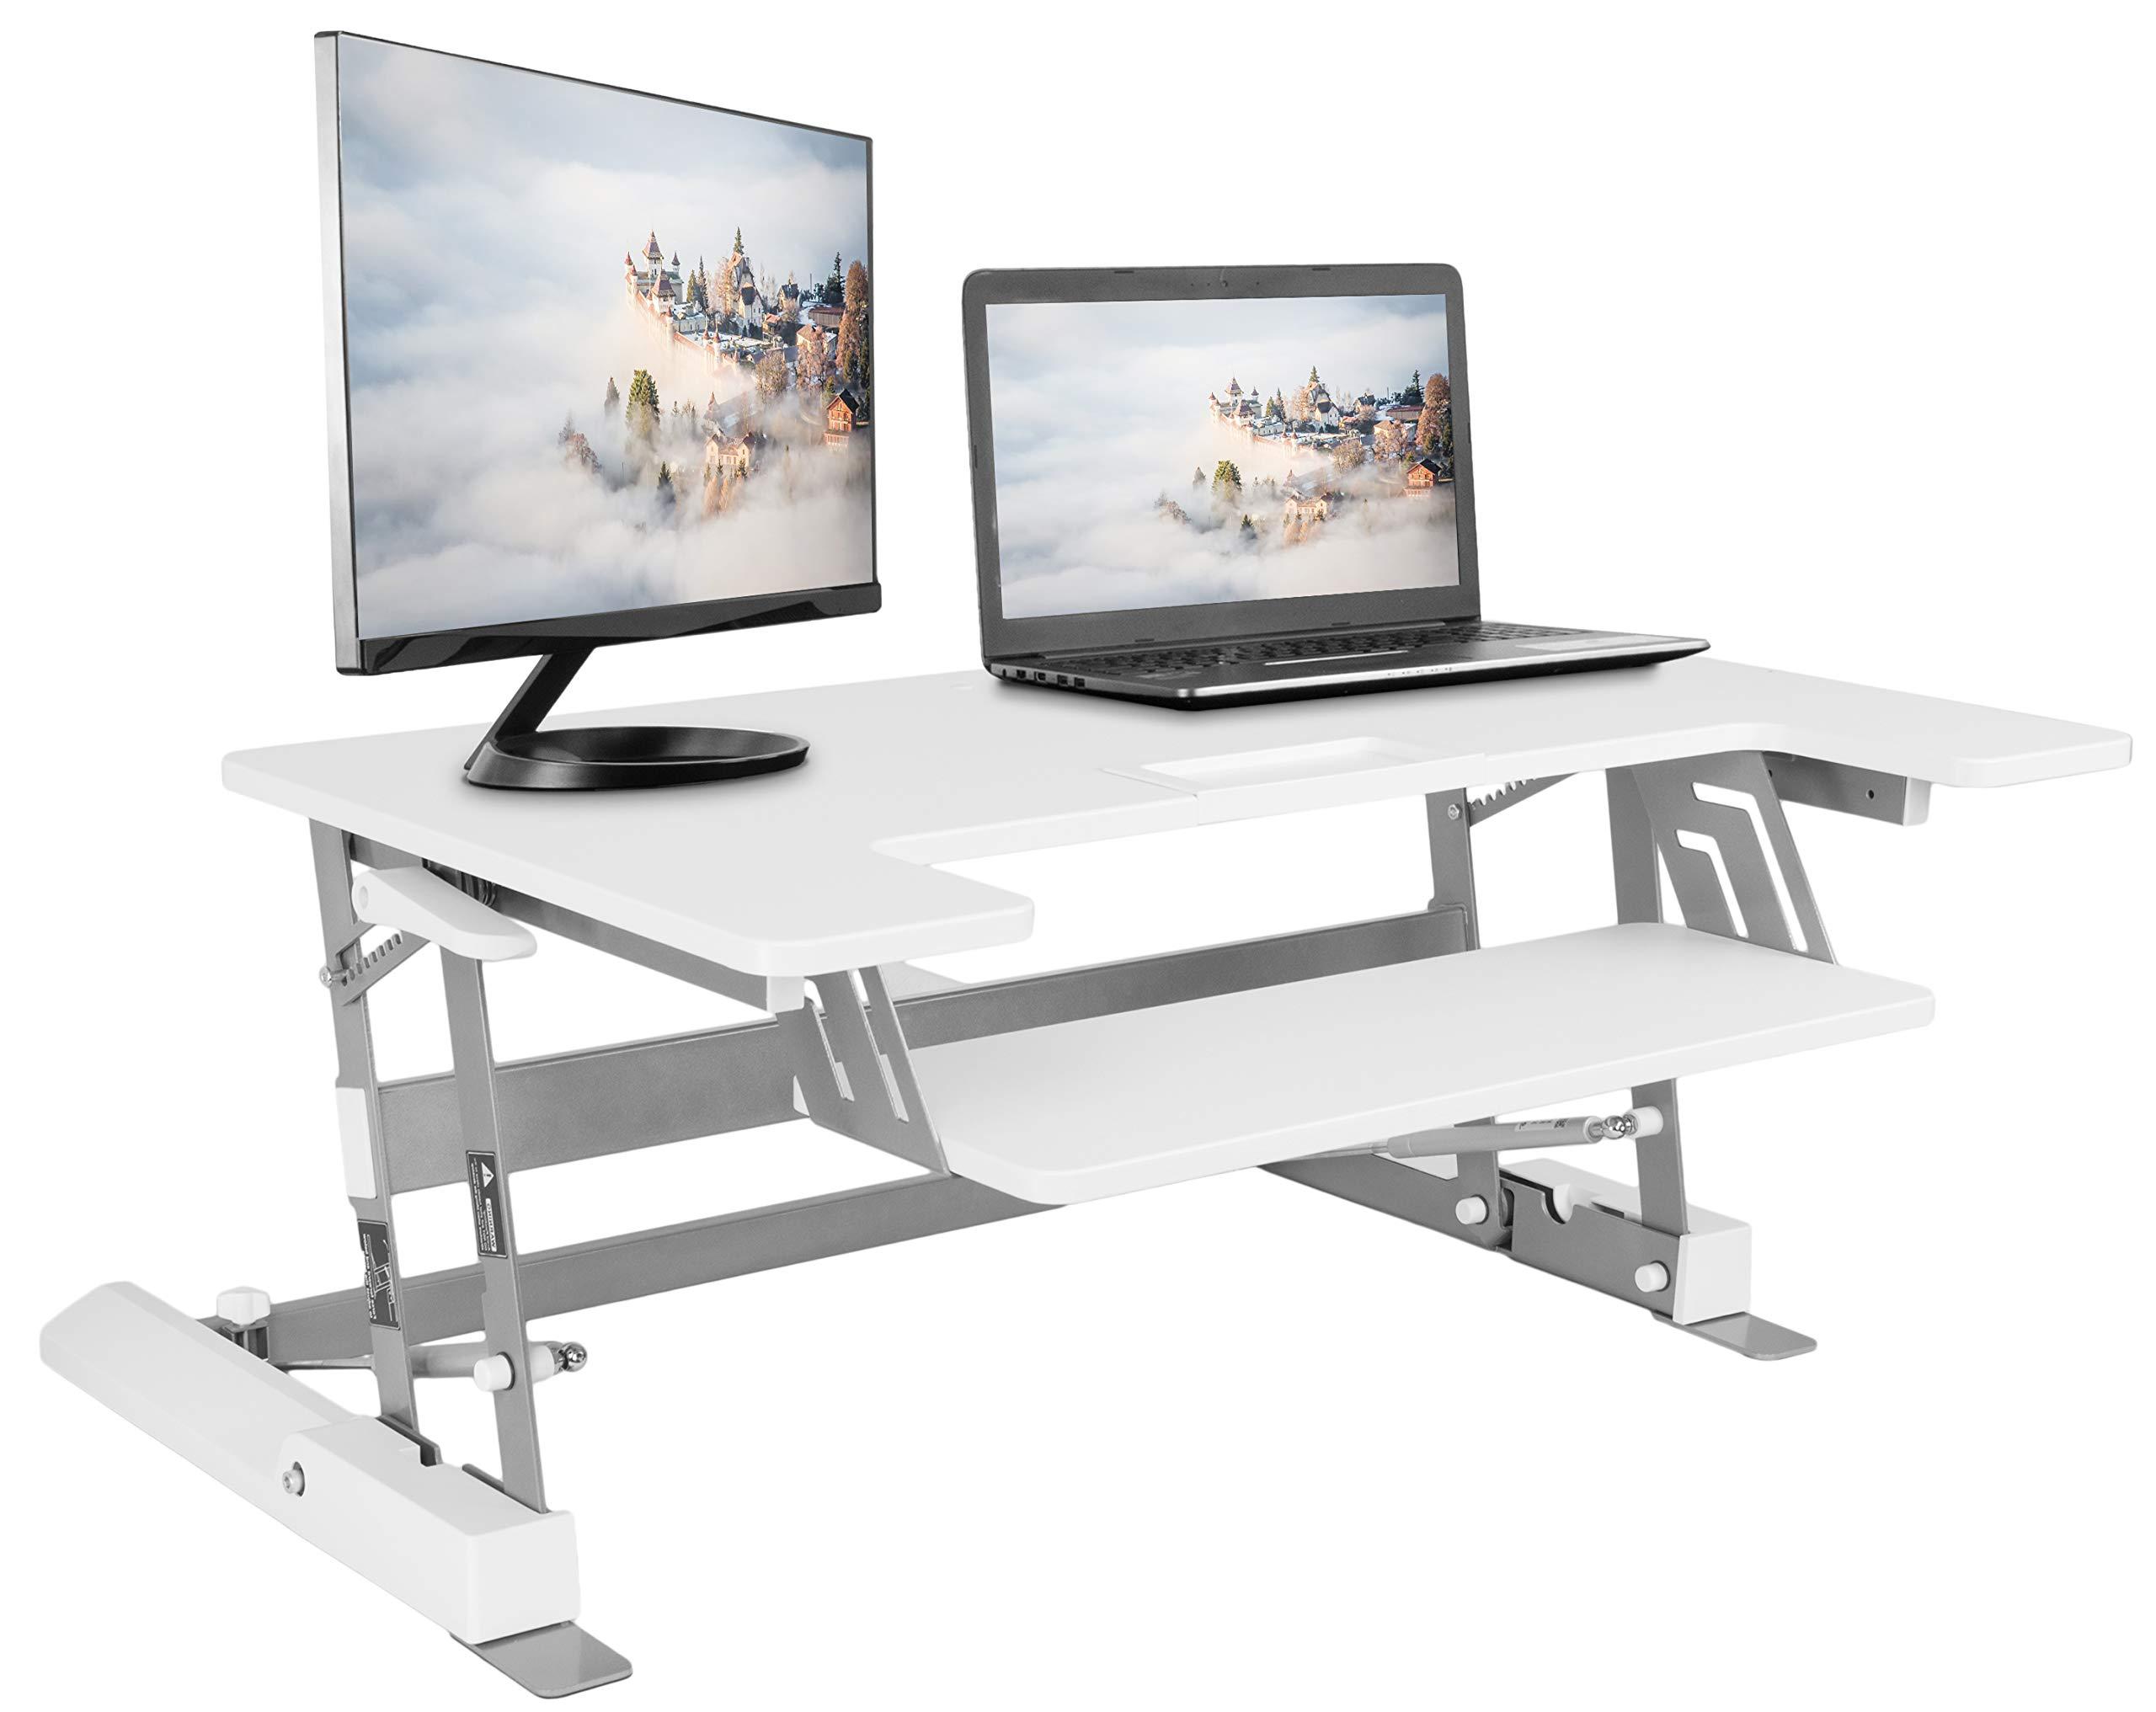 VIVO Height Adjustable Standing Desk Monitor Riser Gas Spring   36'' White Tabletop Sit to Stand Workstation Converter (DESK-V000W)